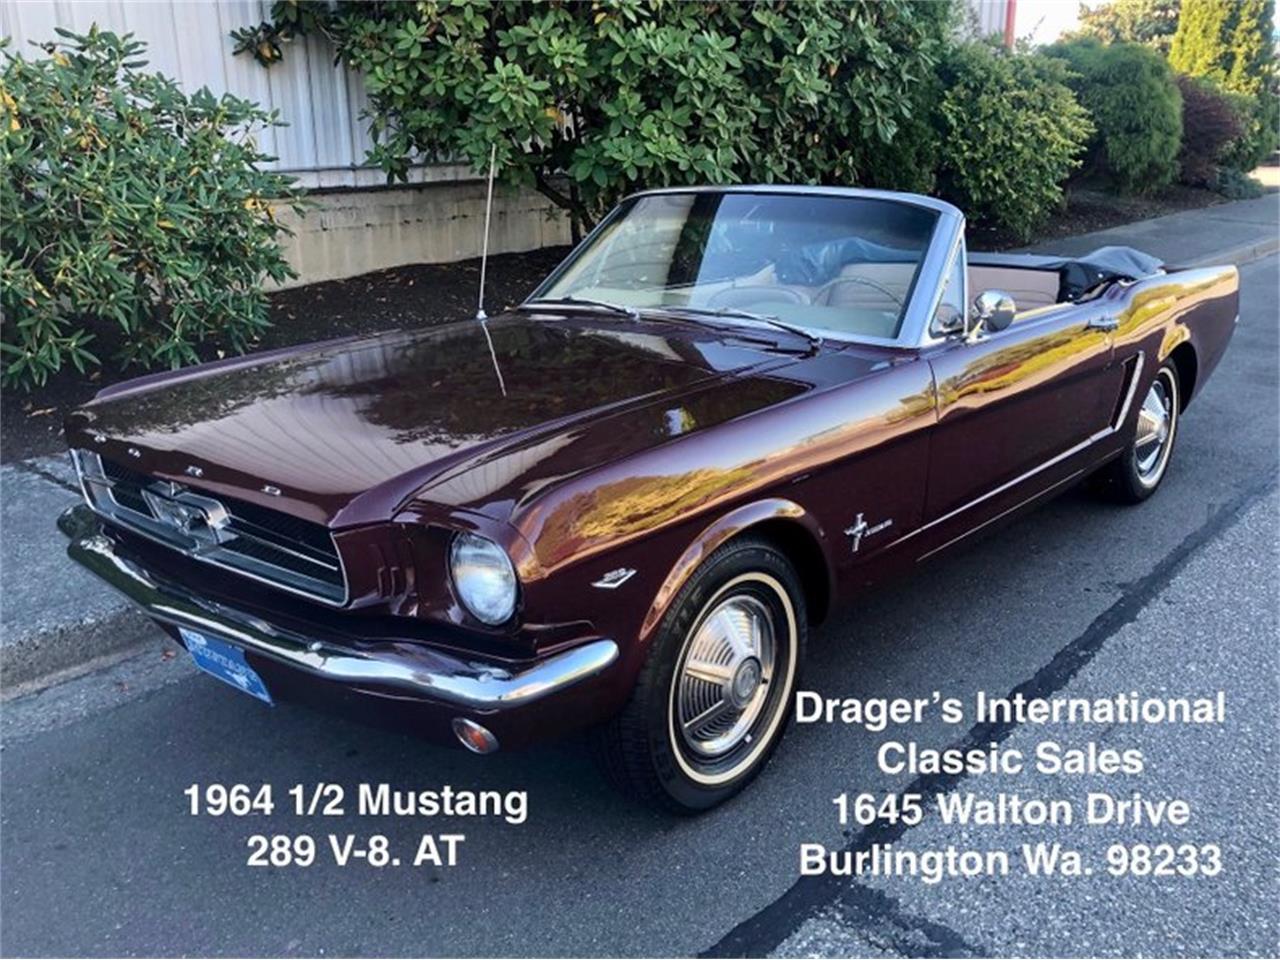 Ford Mustang V8 code d 1964 prix tout compris 1964